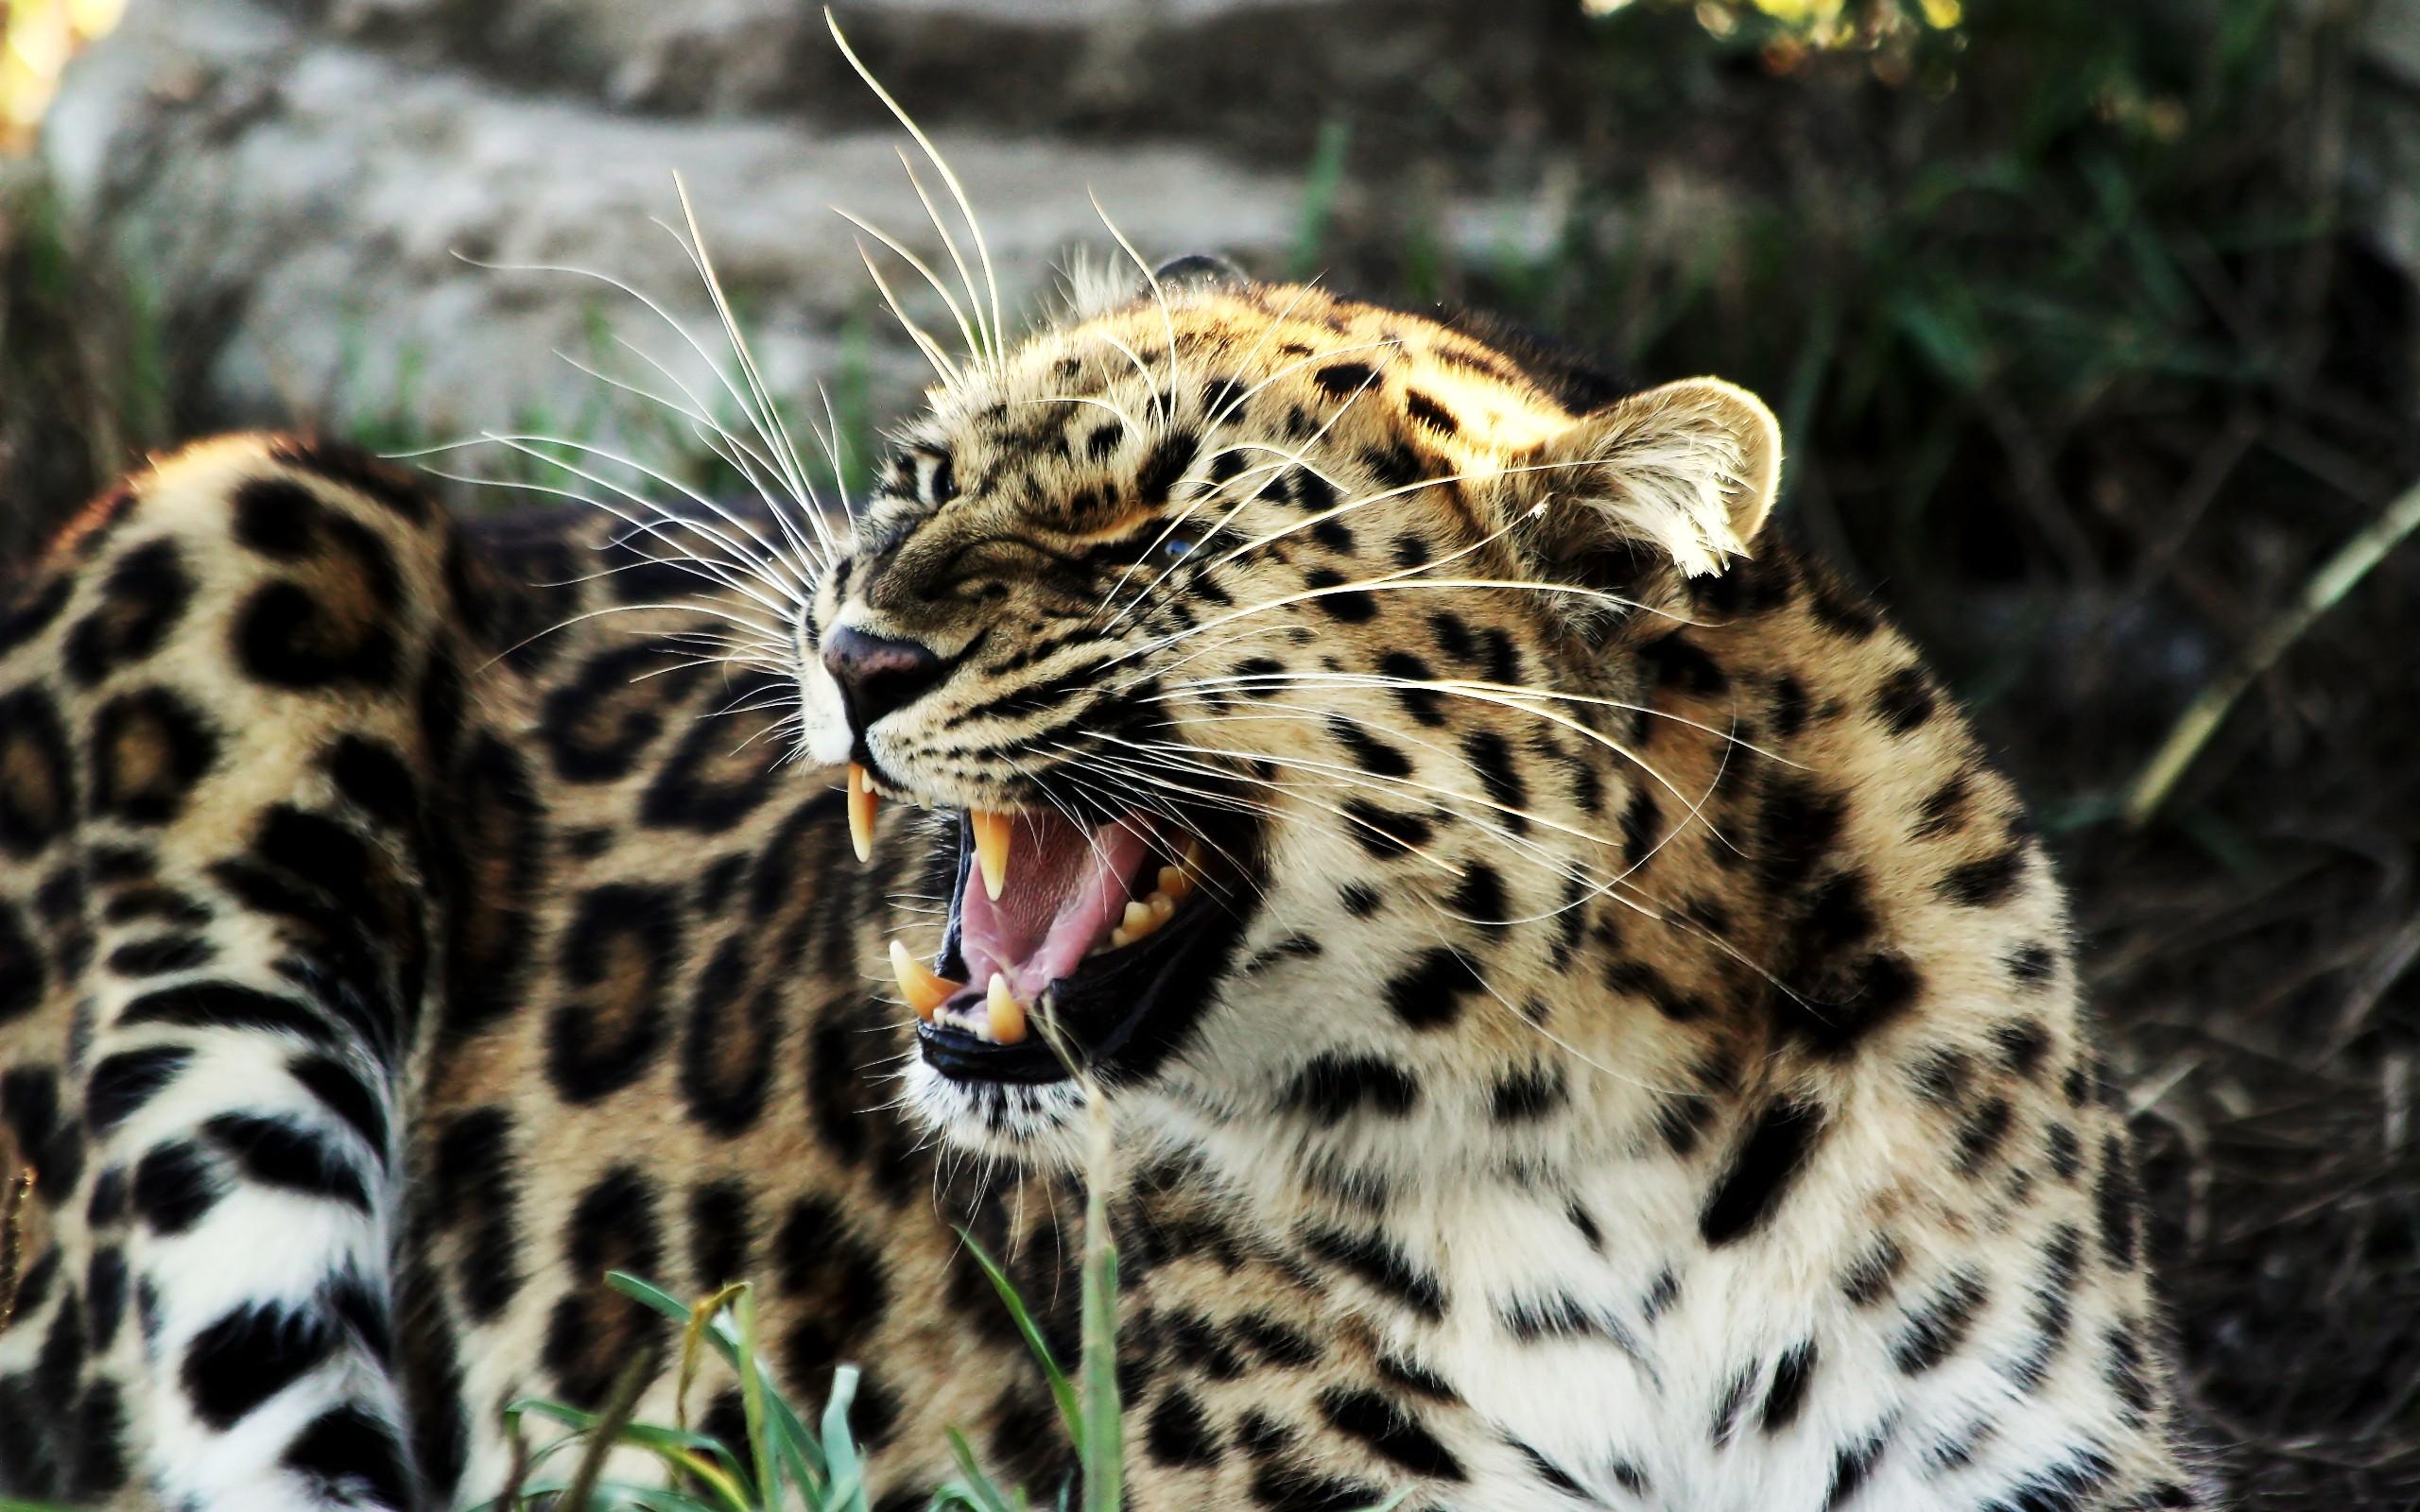 Wallpaper Roaring Tiger Widescreen Lion